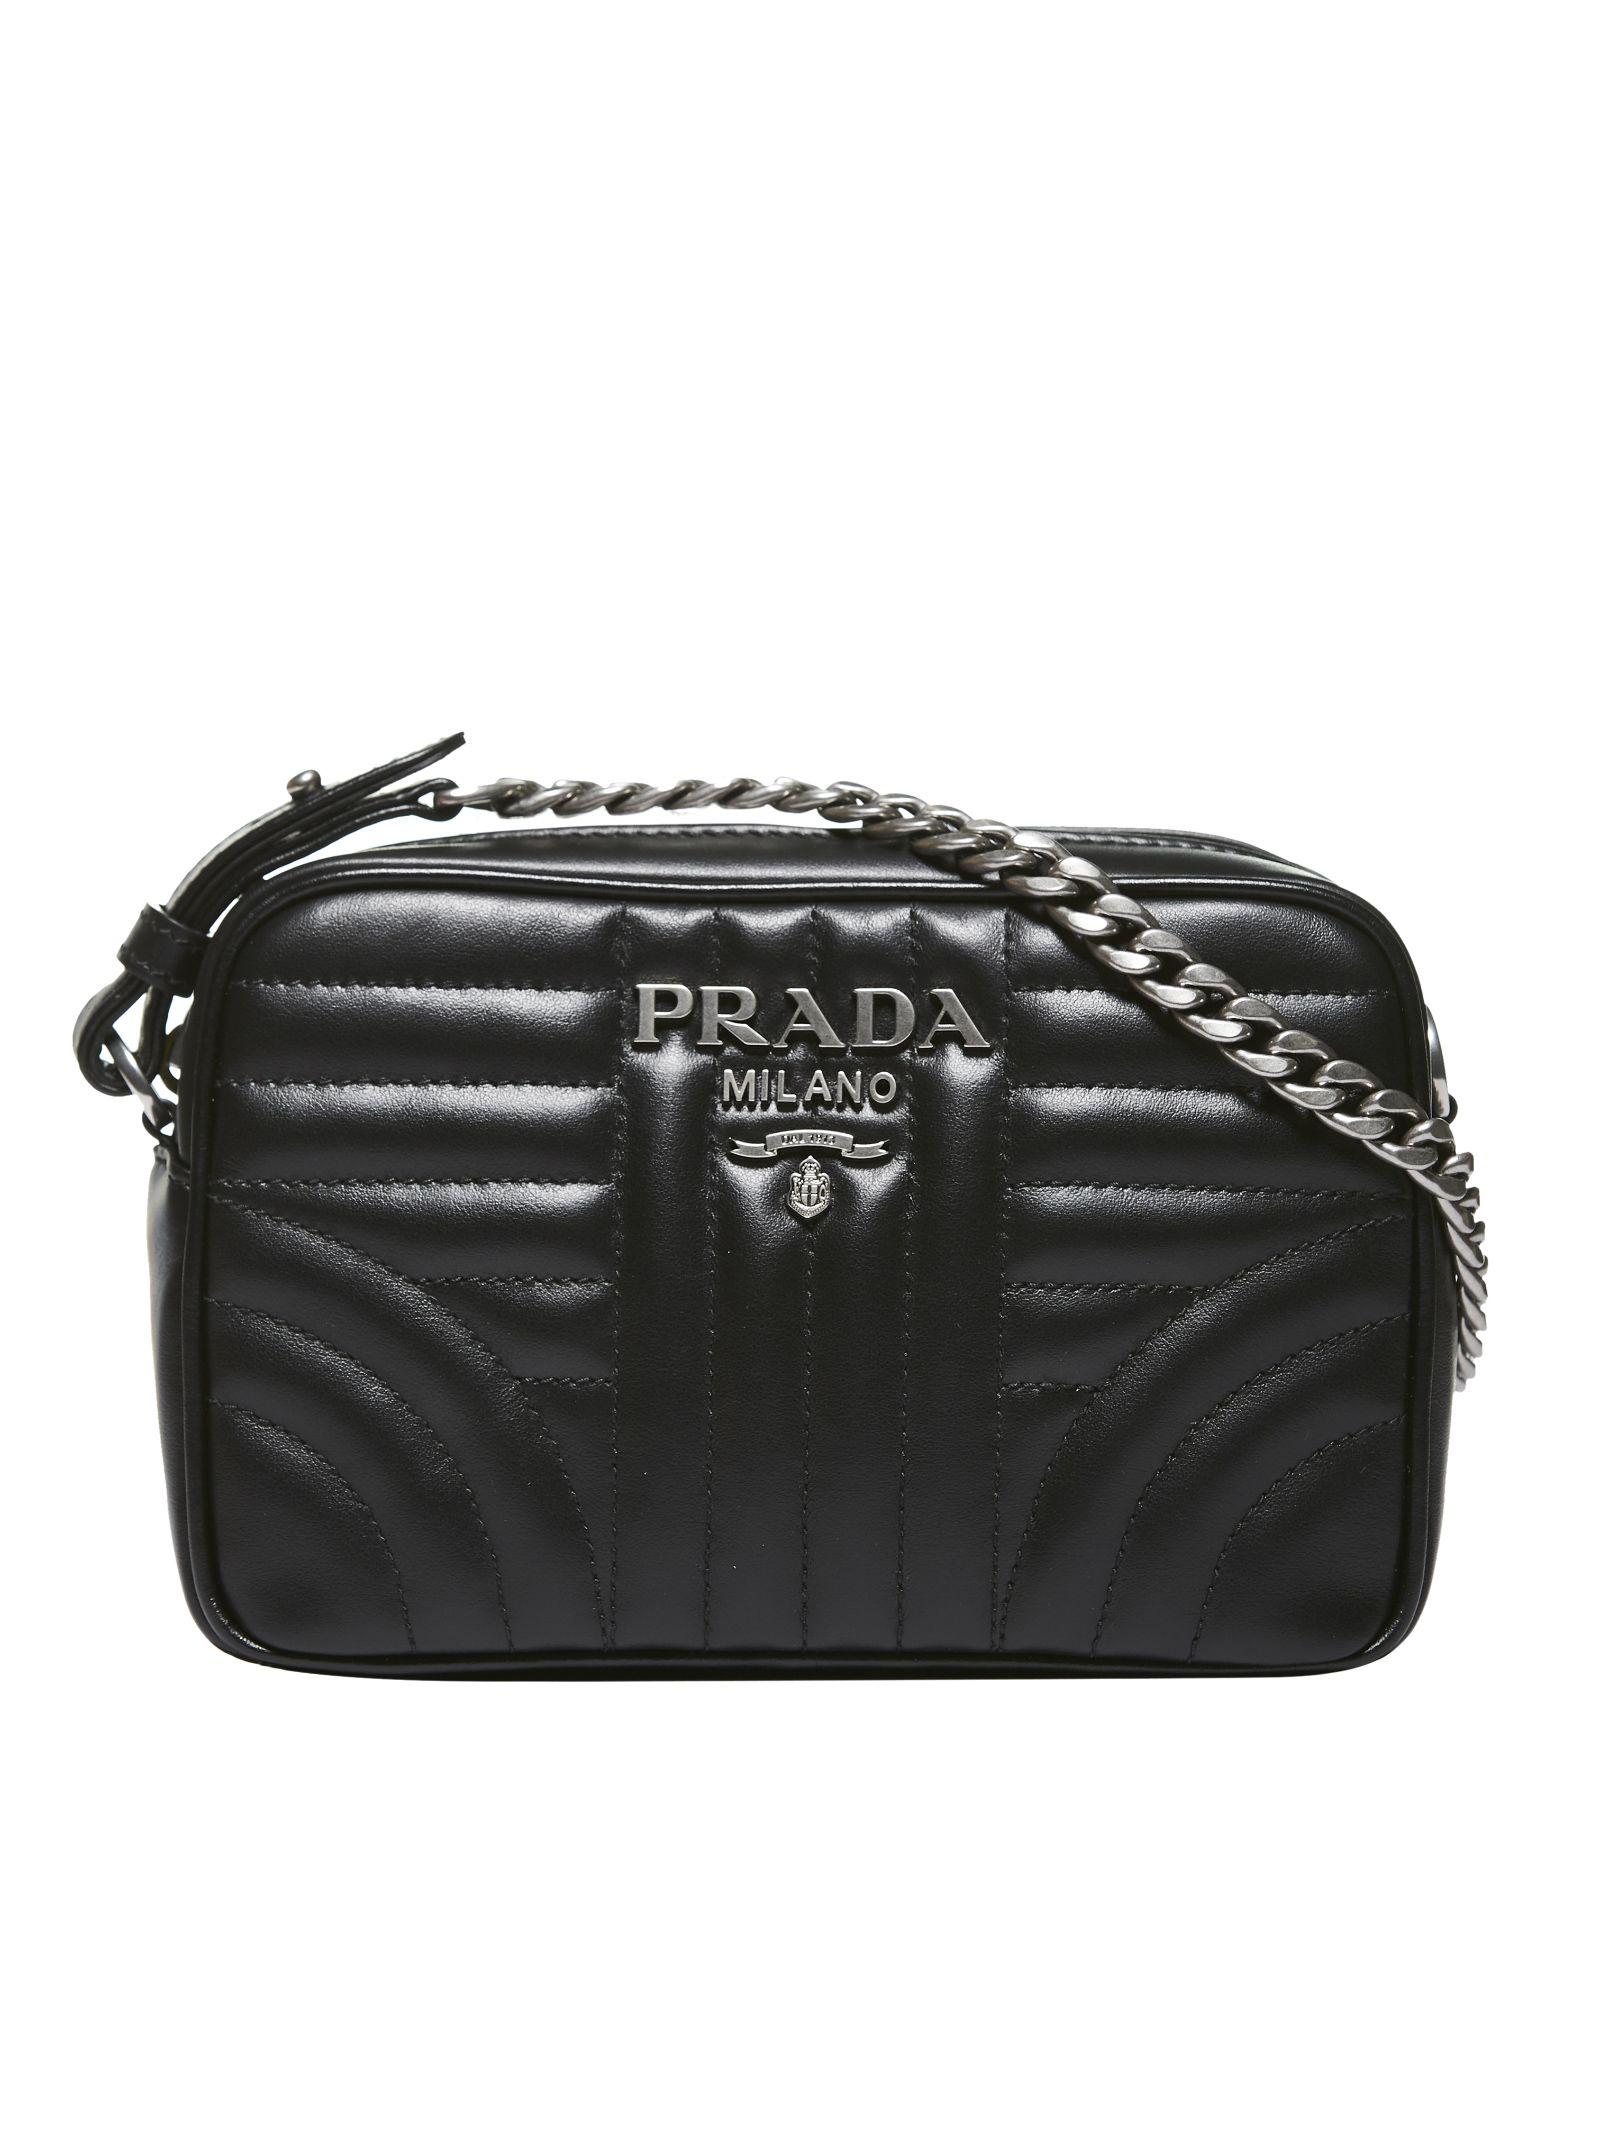 0ad0b1bd1393 Prada Beveled Camera Bag In Nero